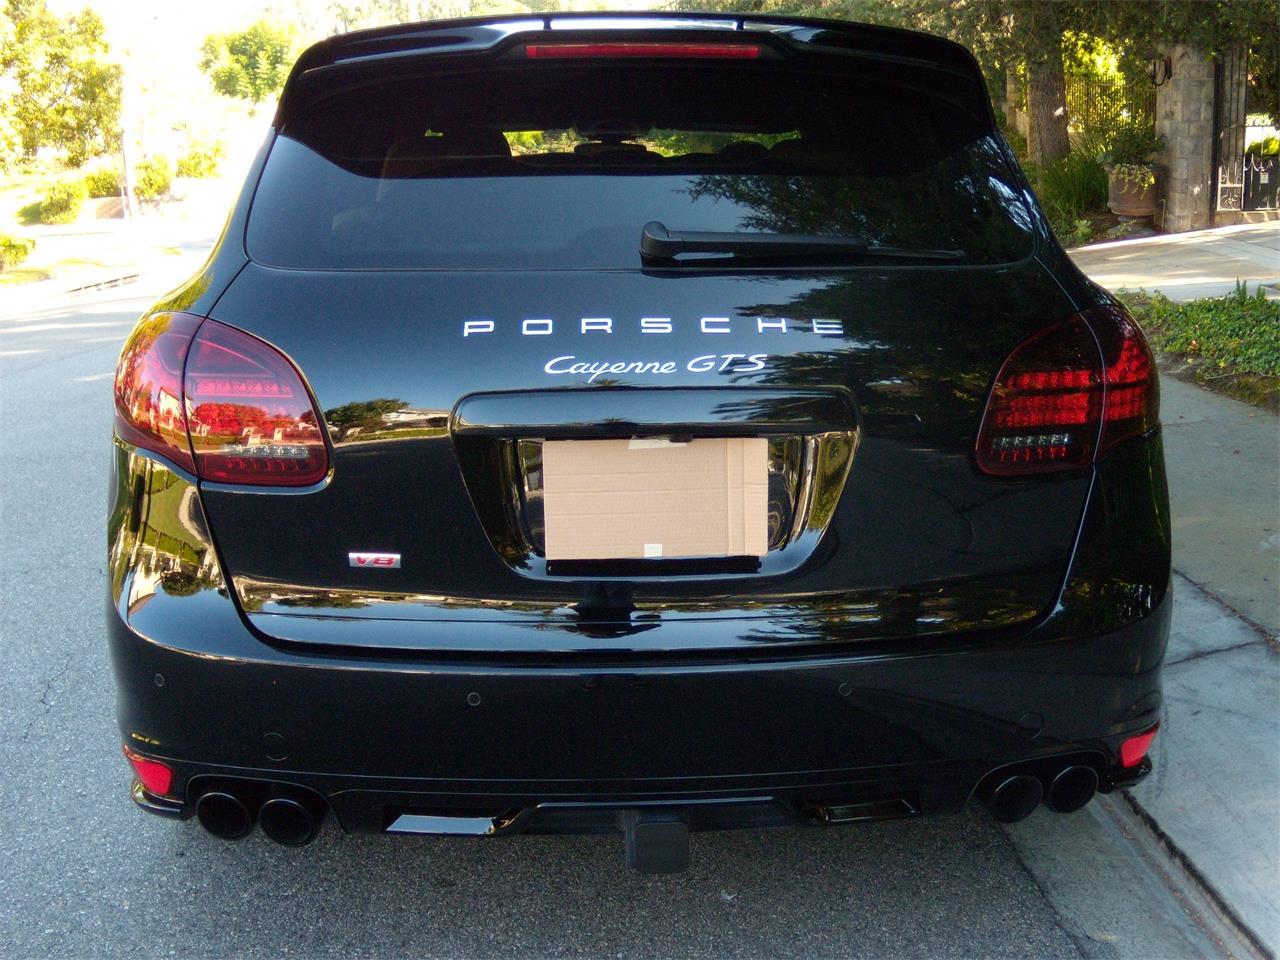 2014 Porsche Cayenne (CC-1409505) for sale in LAGUNA NIGUEL, California